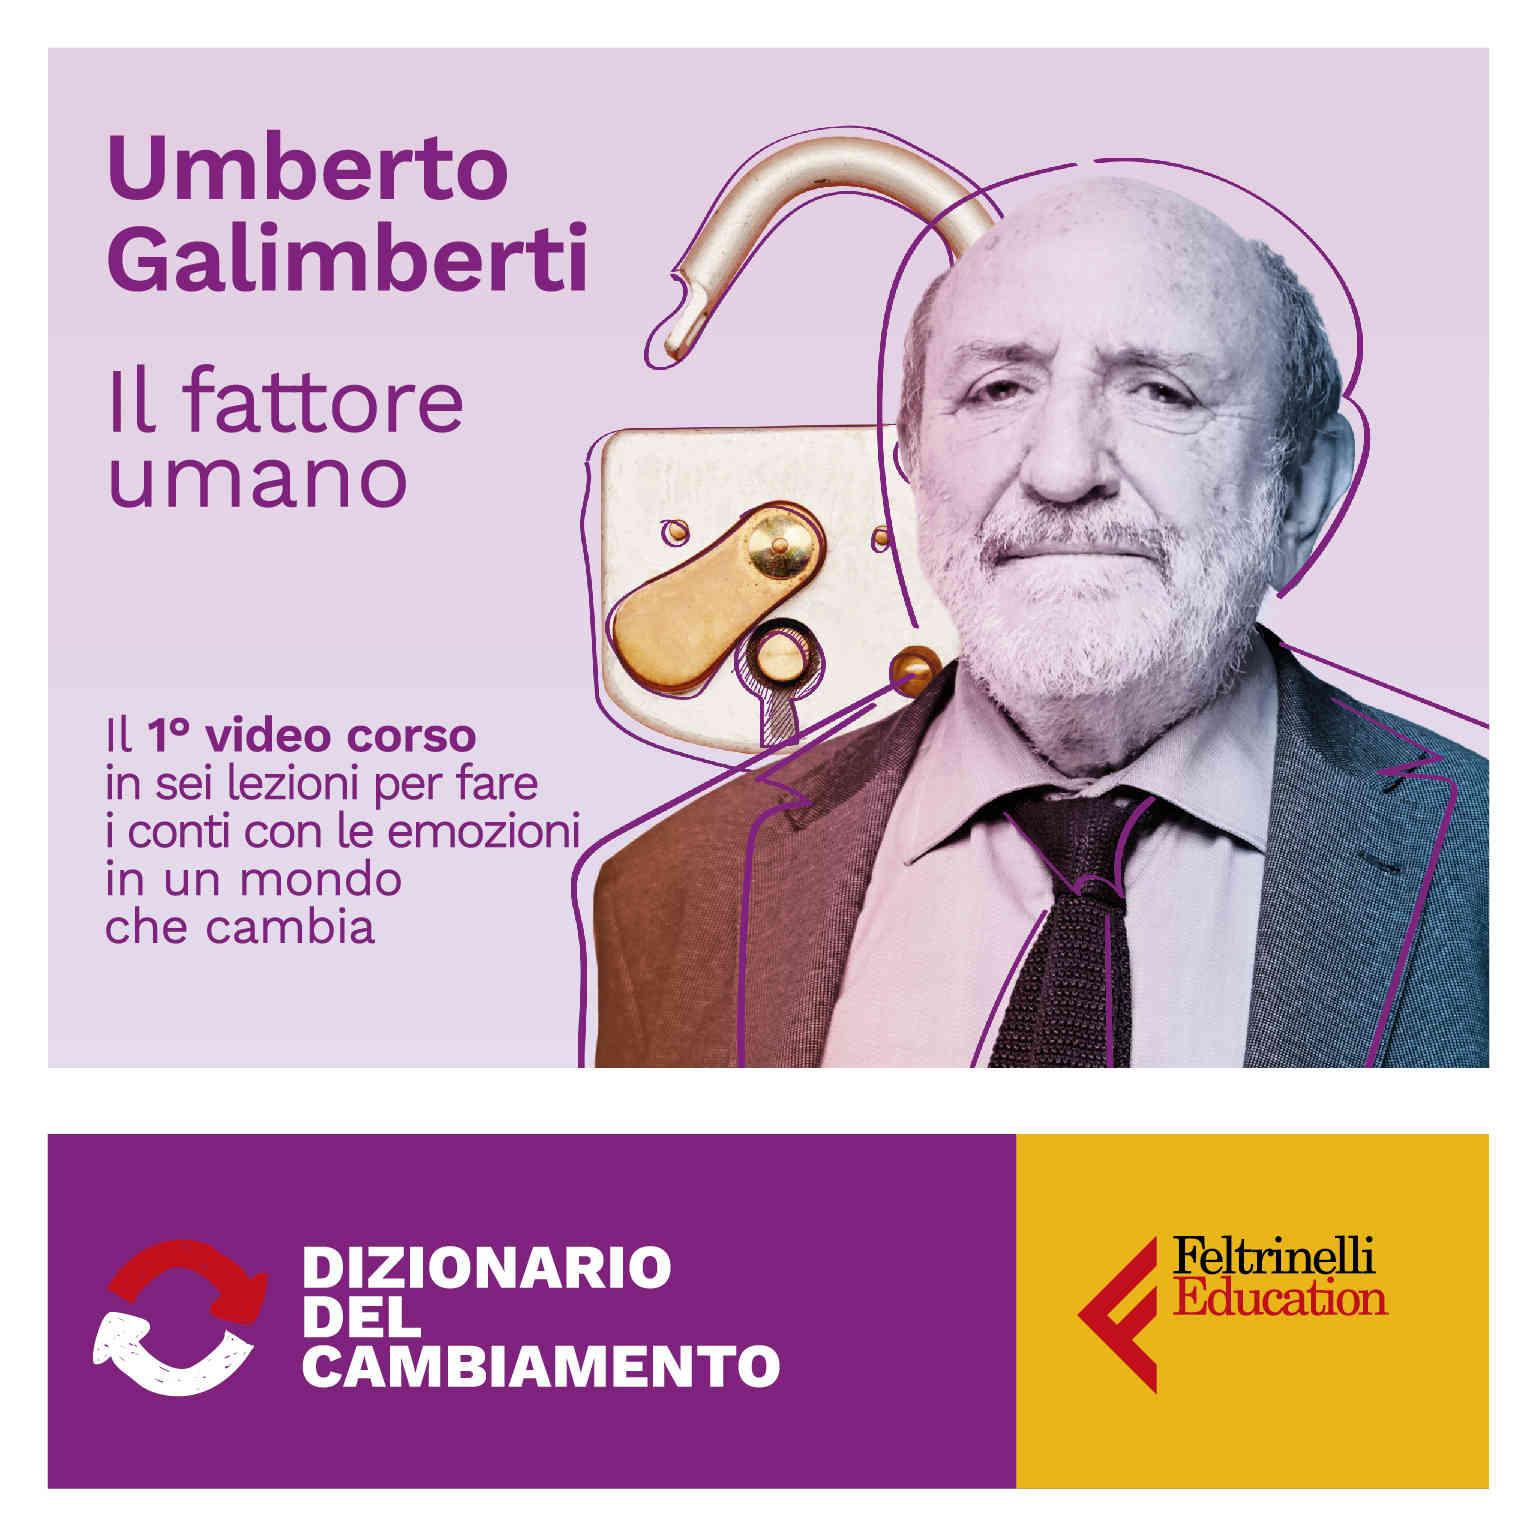 galimberti feltrinelli education